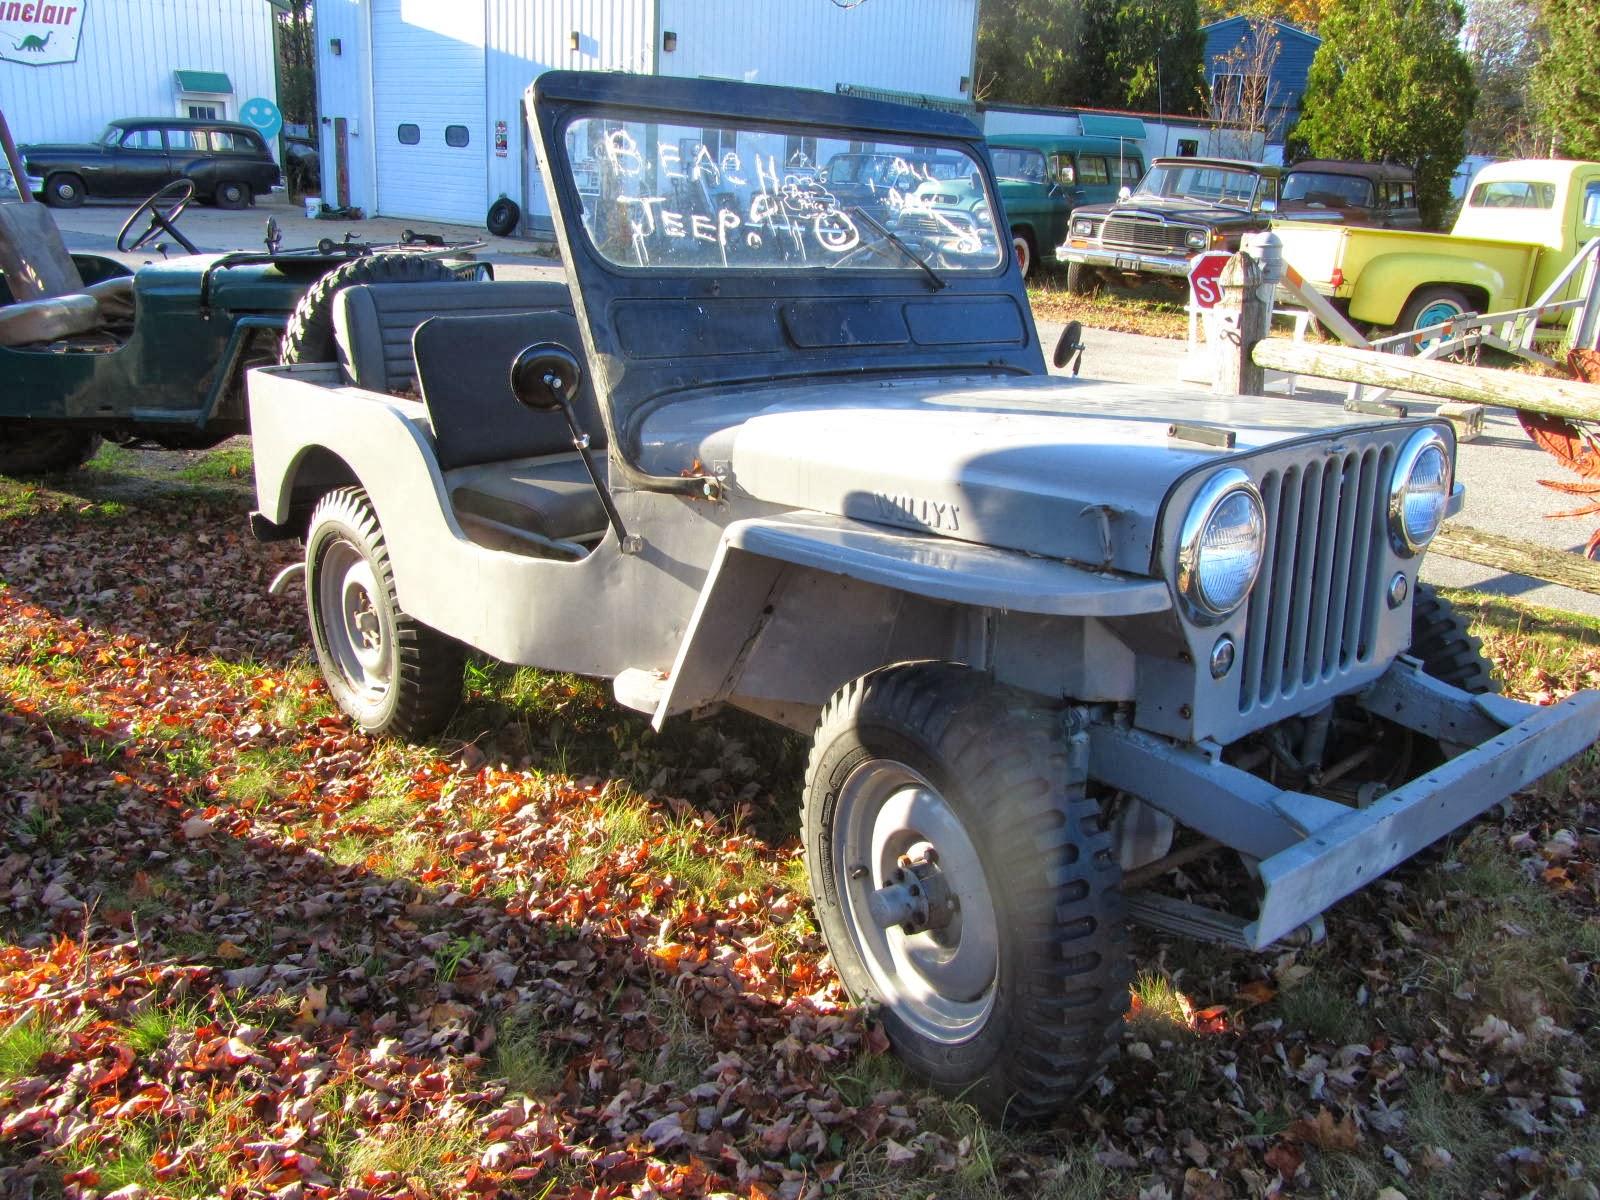 autoliterate maine 1946 jeeps. Black Bedroom Furniture Sets. Home Design Ideas